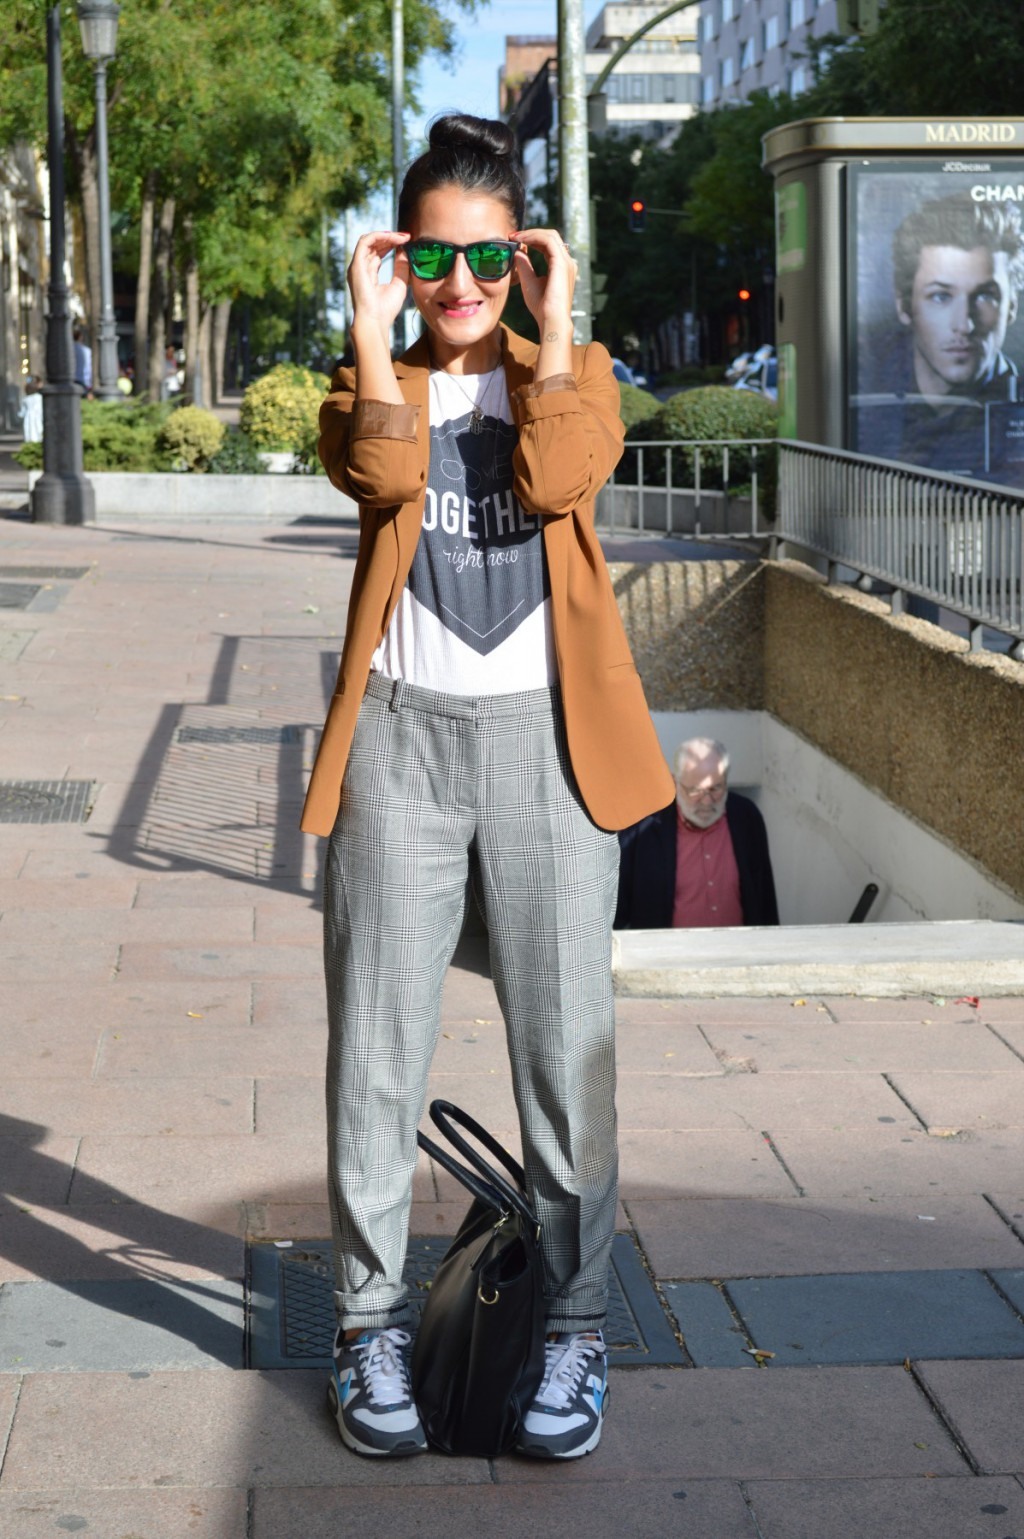 Blazer: h&m (new) Camiseta / t-shirt: Lefties  Pantalones / pants: Mango Sneakers: Nike Bolso / bag: h&m (old) Gafas de sol / sunglasses: Hawkers